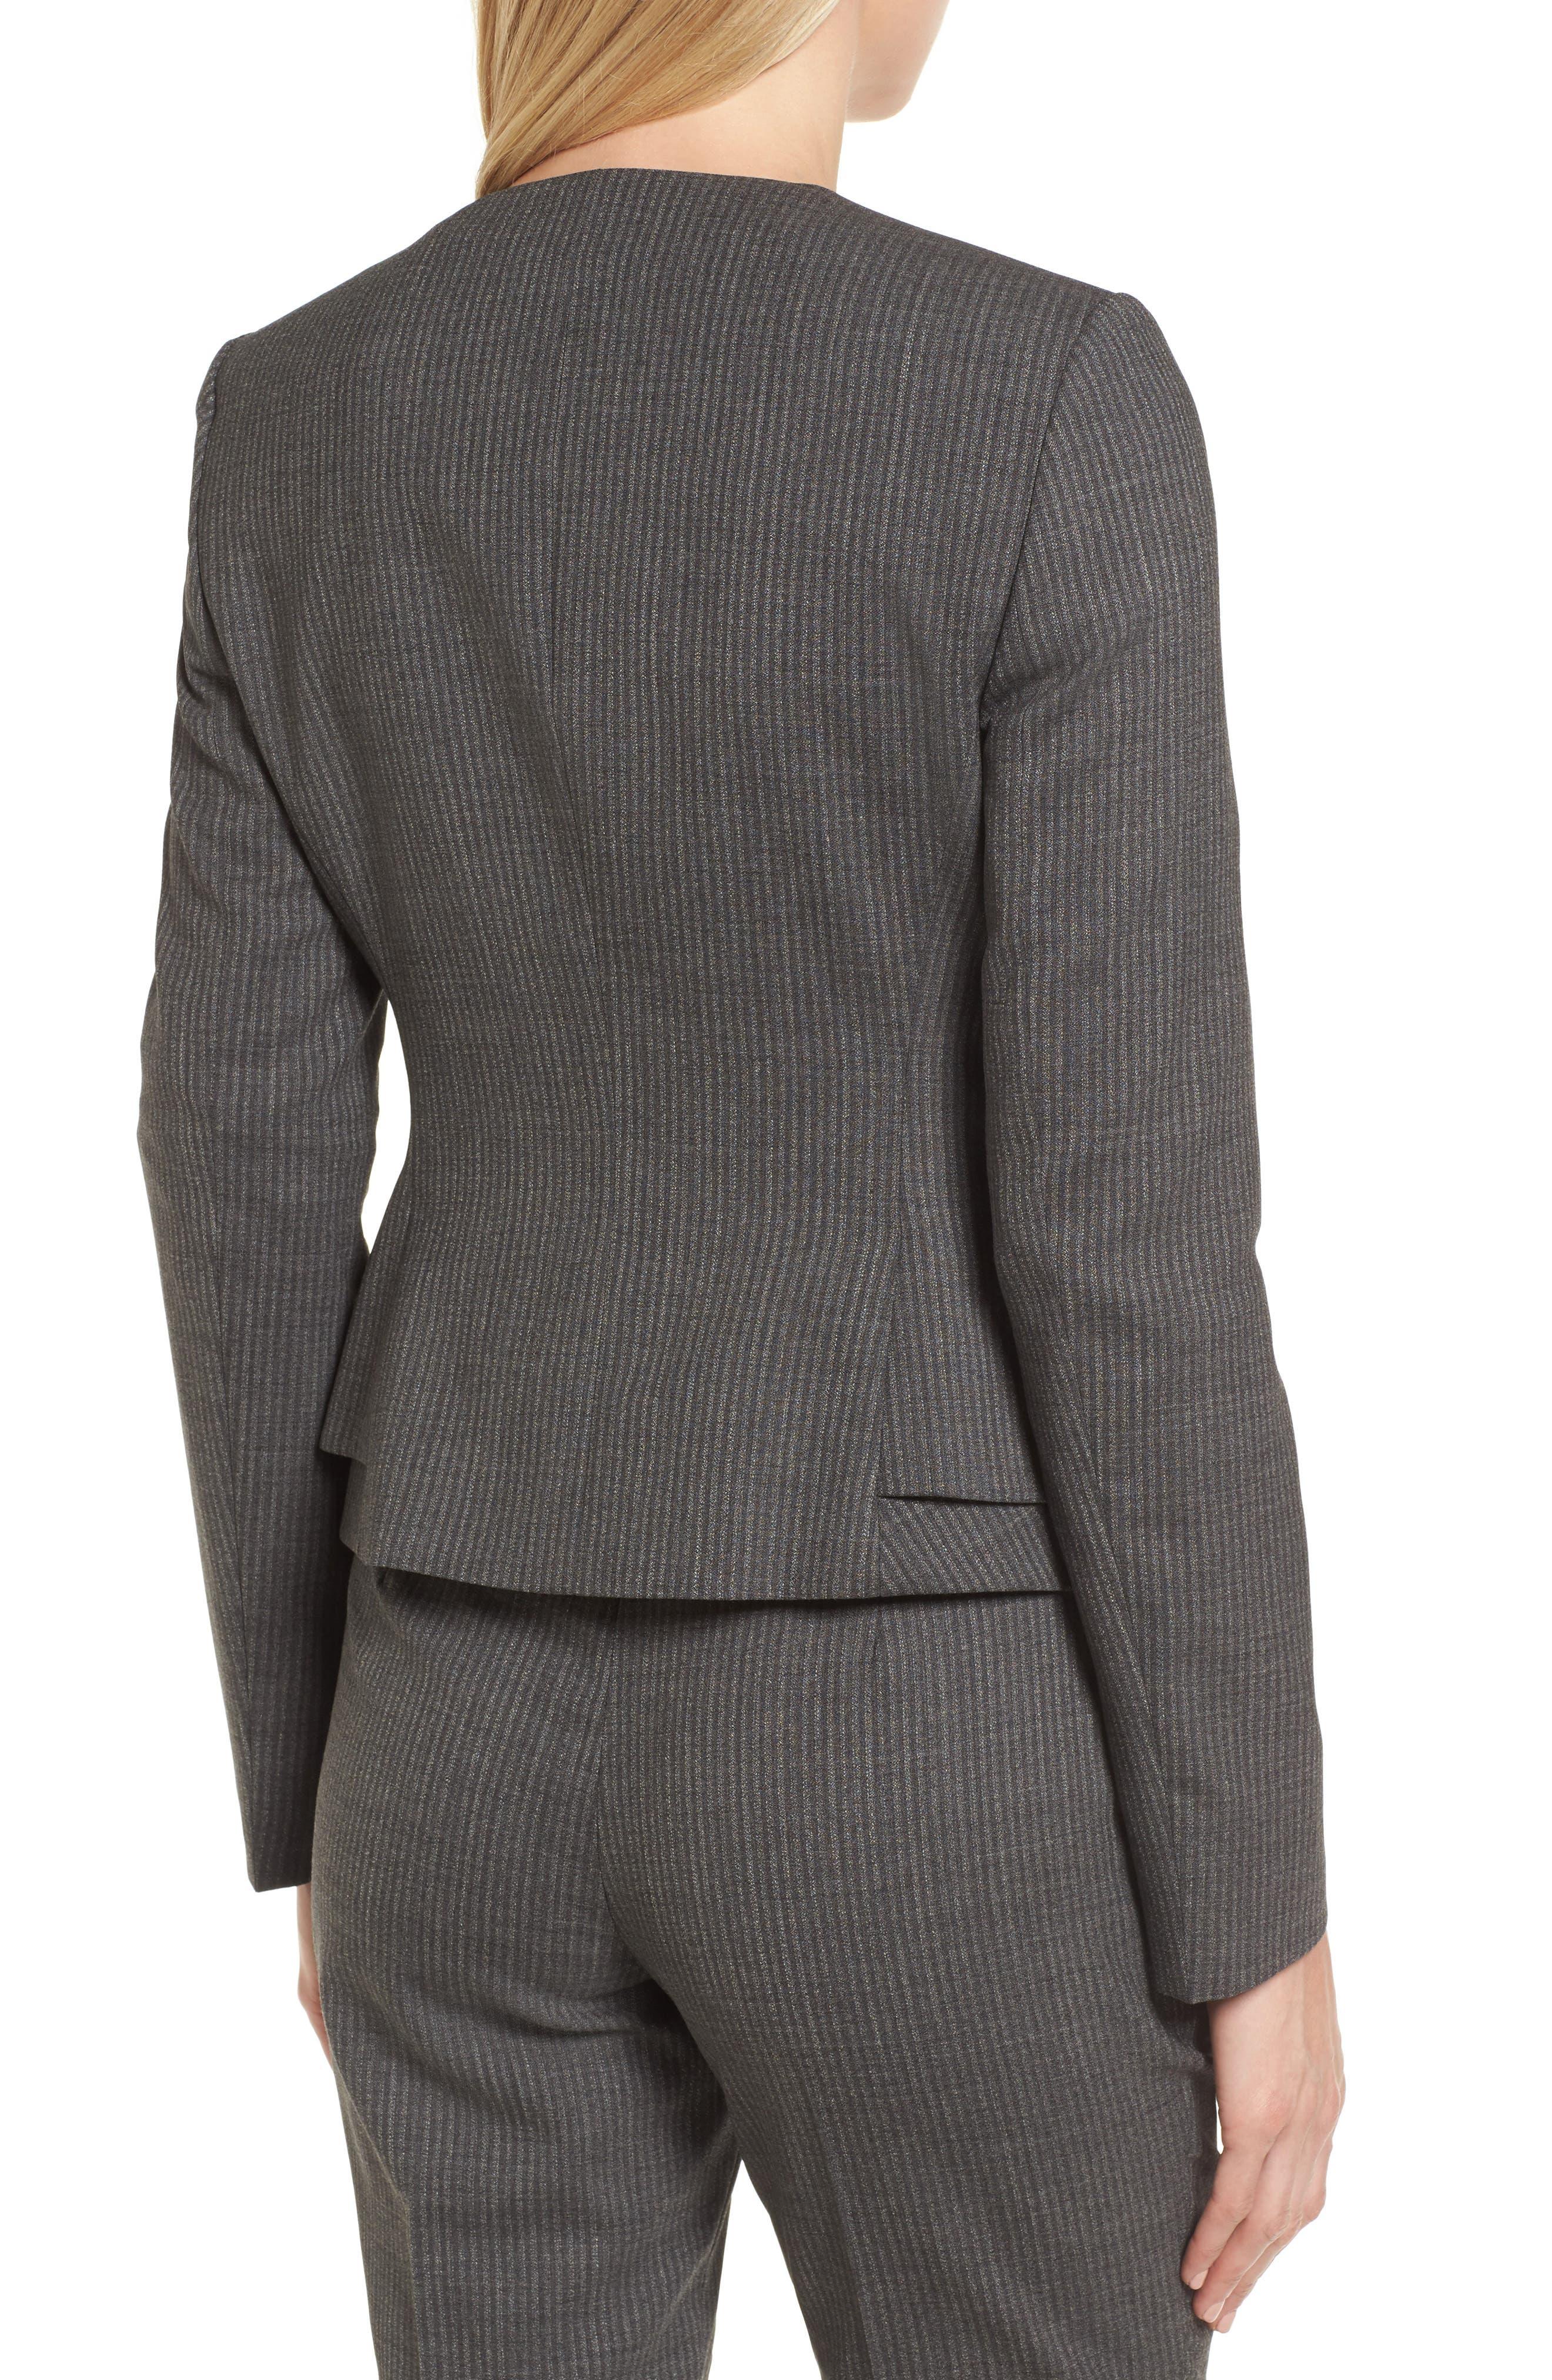 Jasyma Stripe Wool Suit Jacket,                             Alternate thumbnail 2, color,                             Dark Grey Fantasy